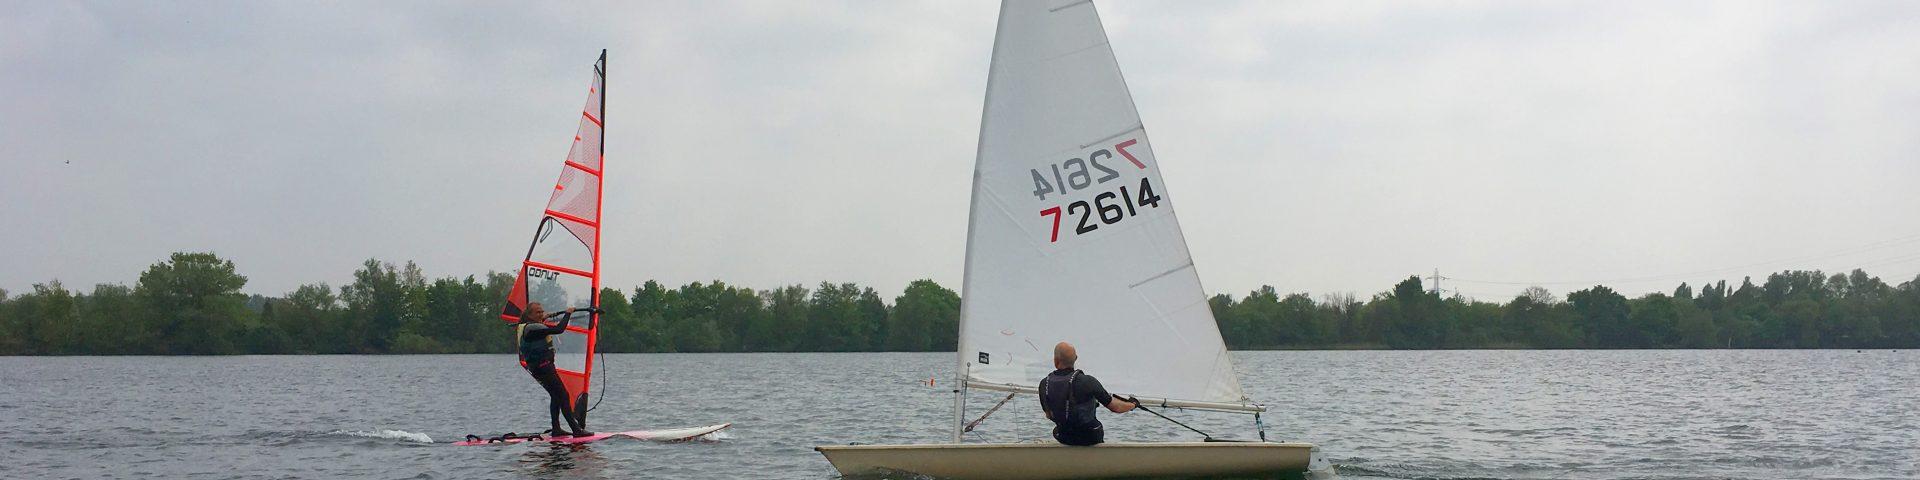 Buddy sailing